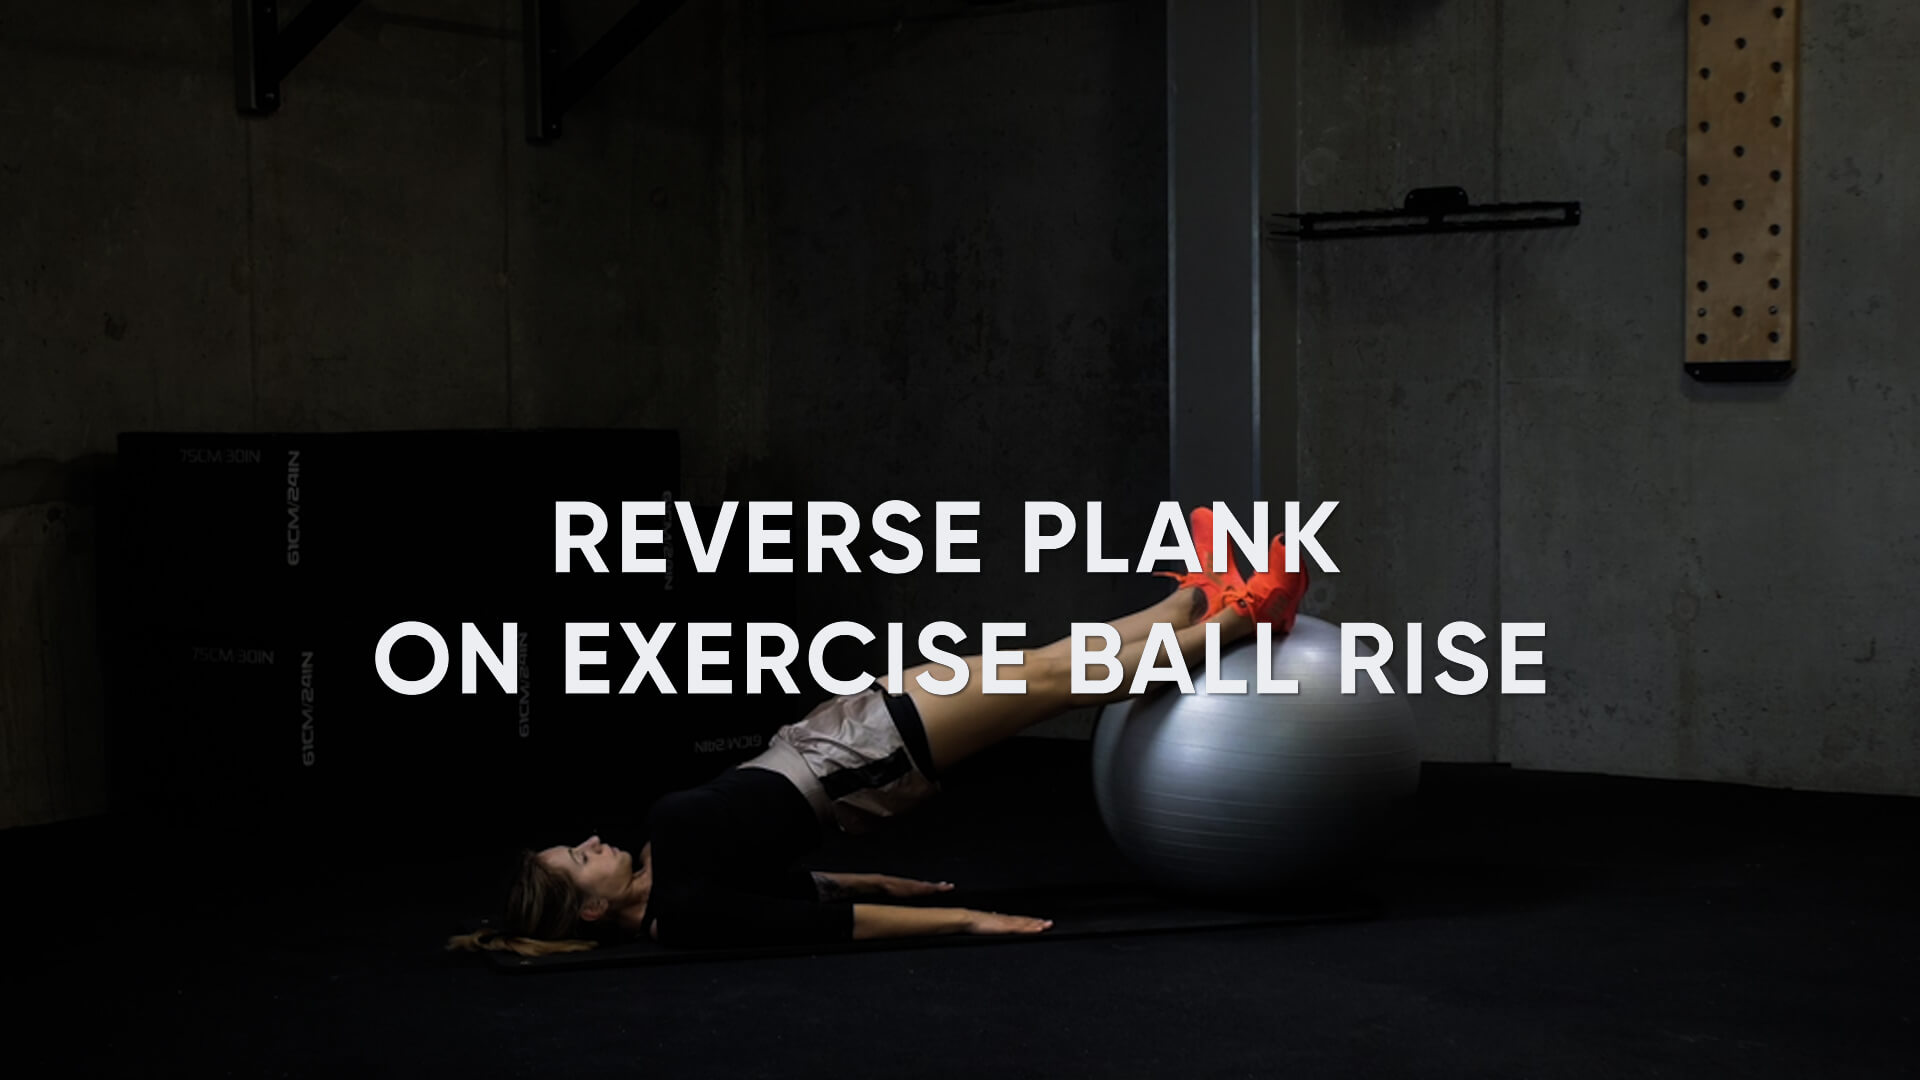 Reverse Plank on Exercise Ball Raise